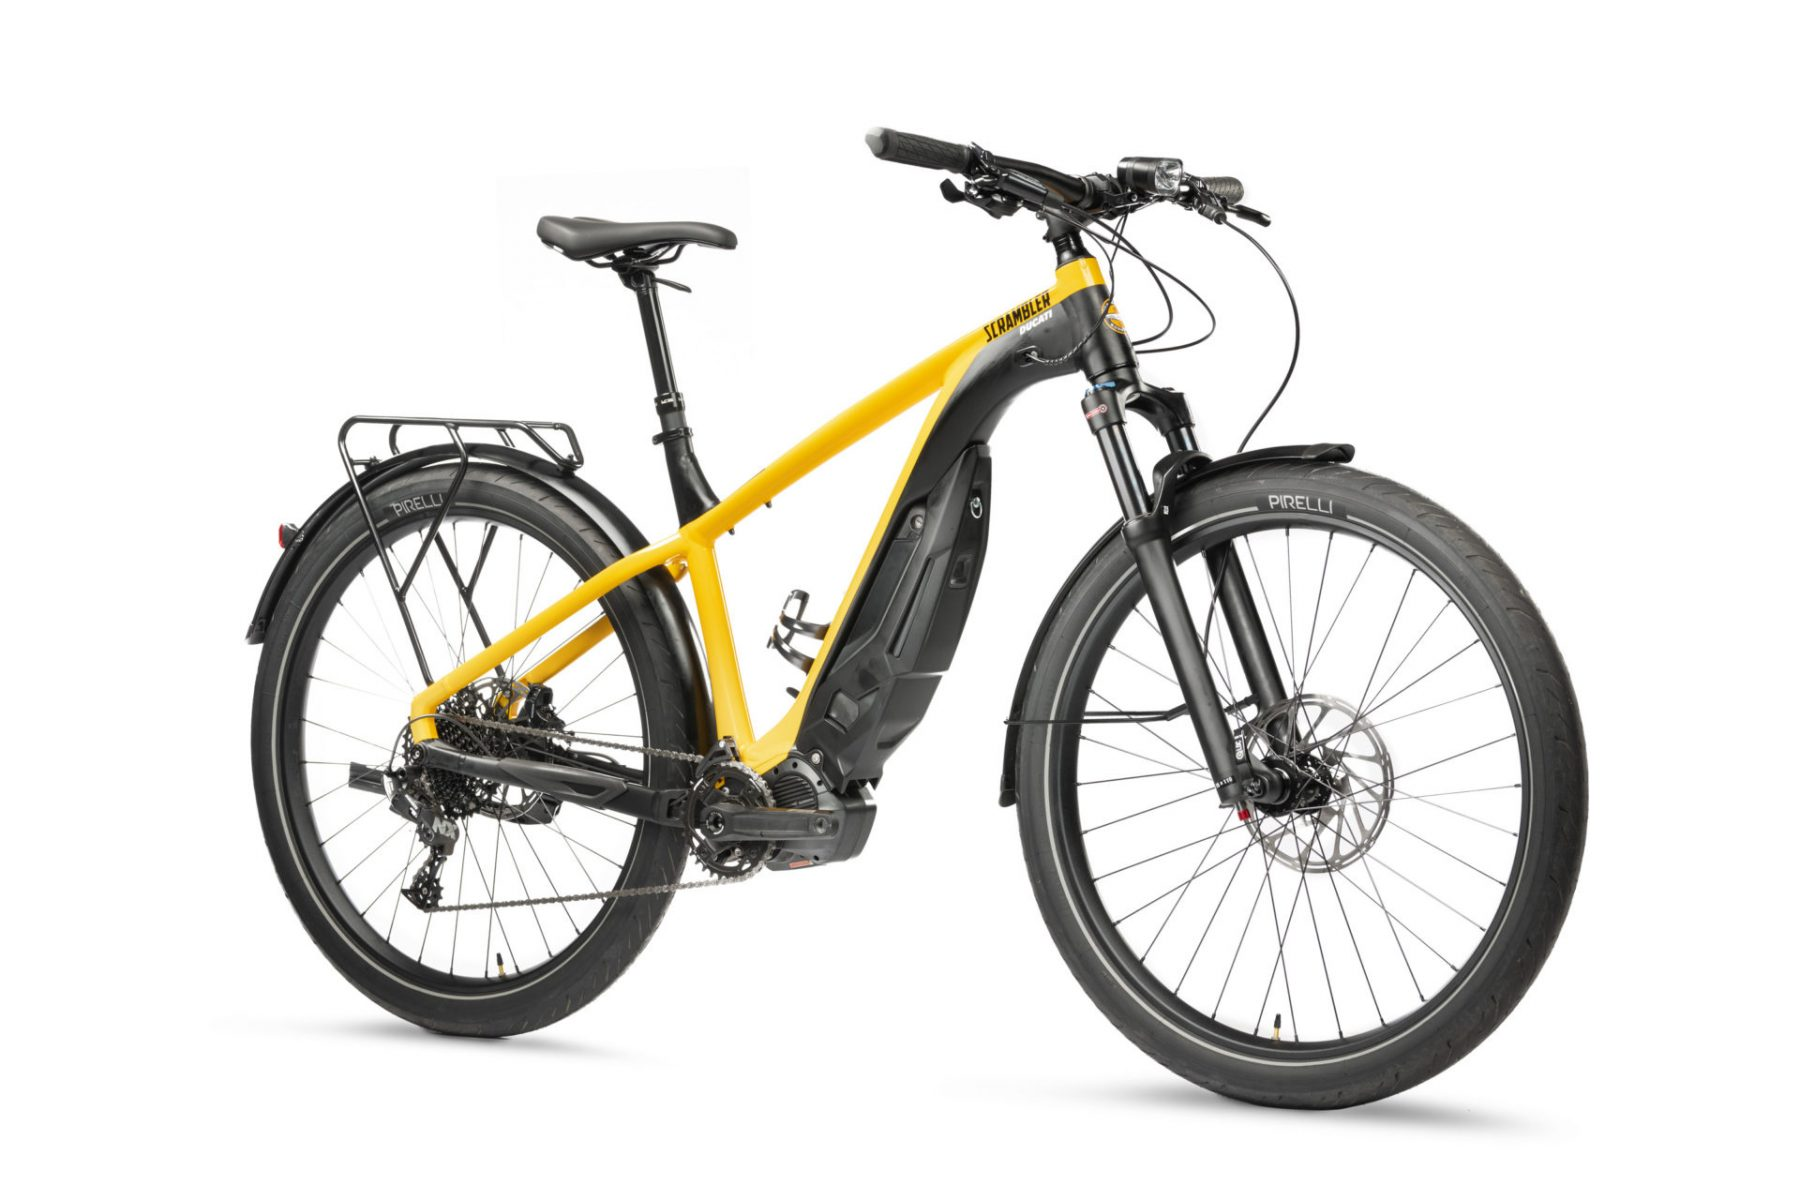 Bicicletas E-Scrambler Ducati